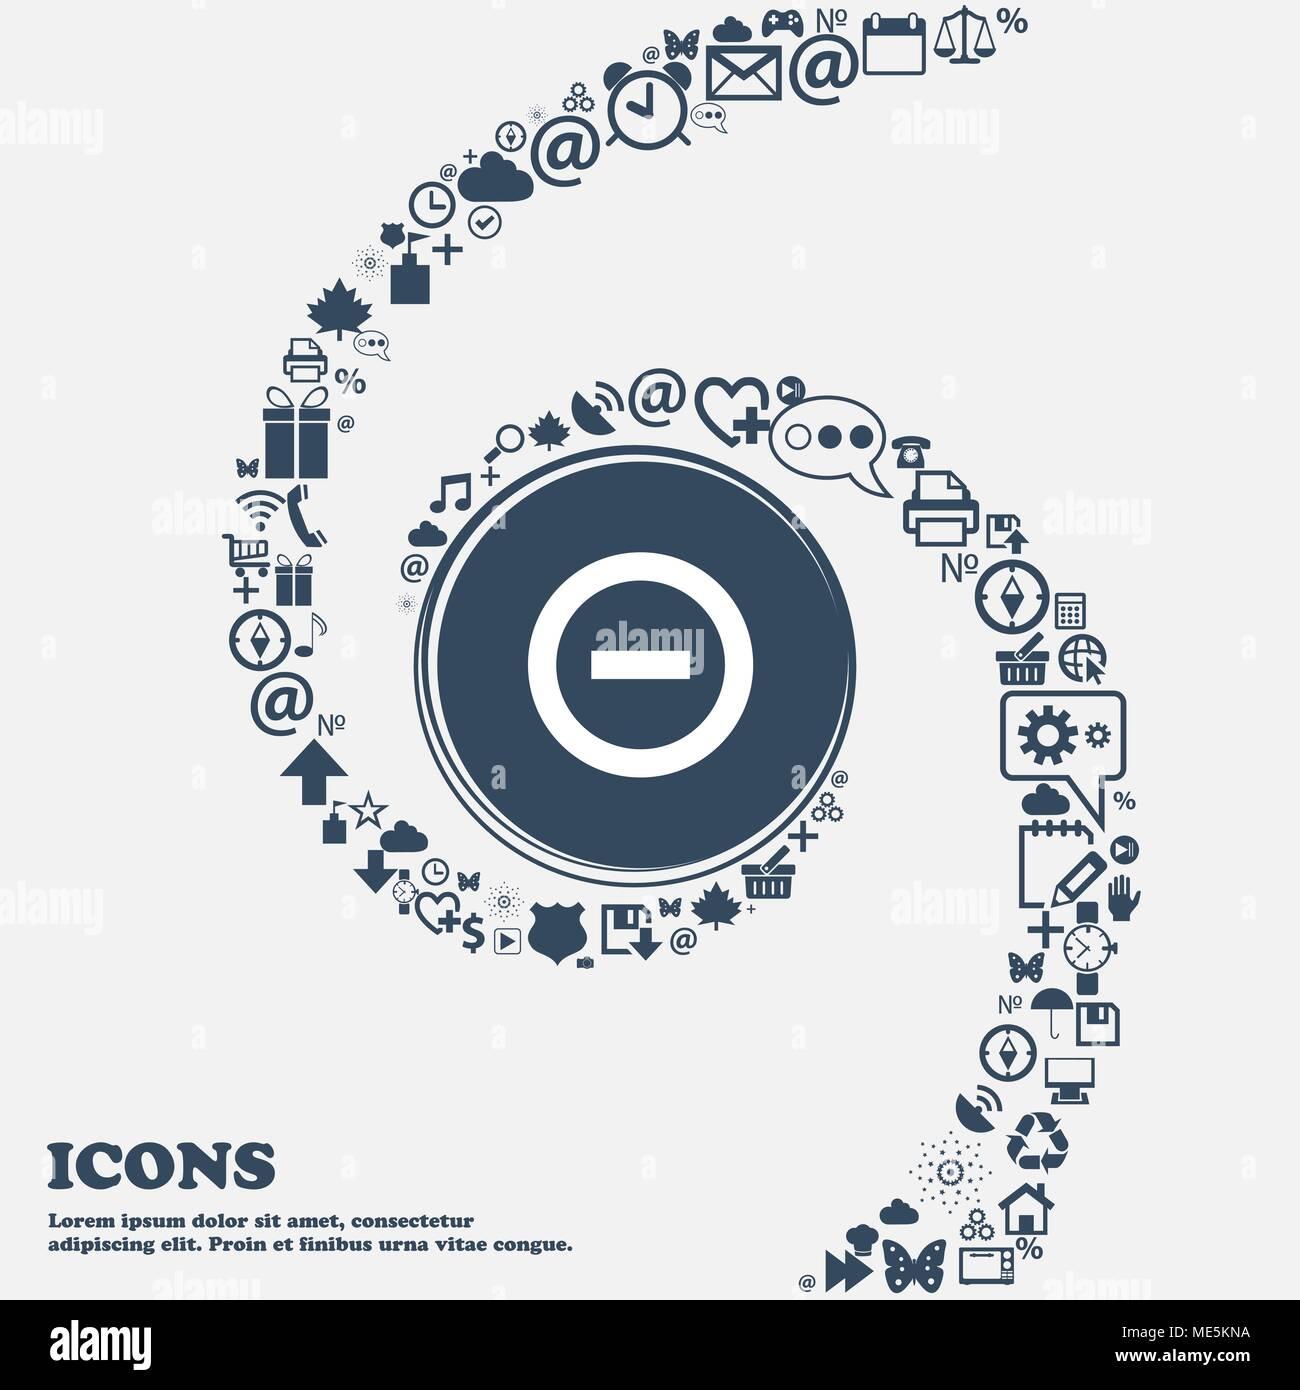 Stop Icon Stock Photos & Stop Icon Stock Images - Alamy